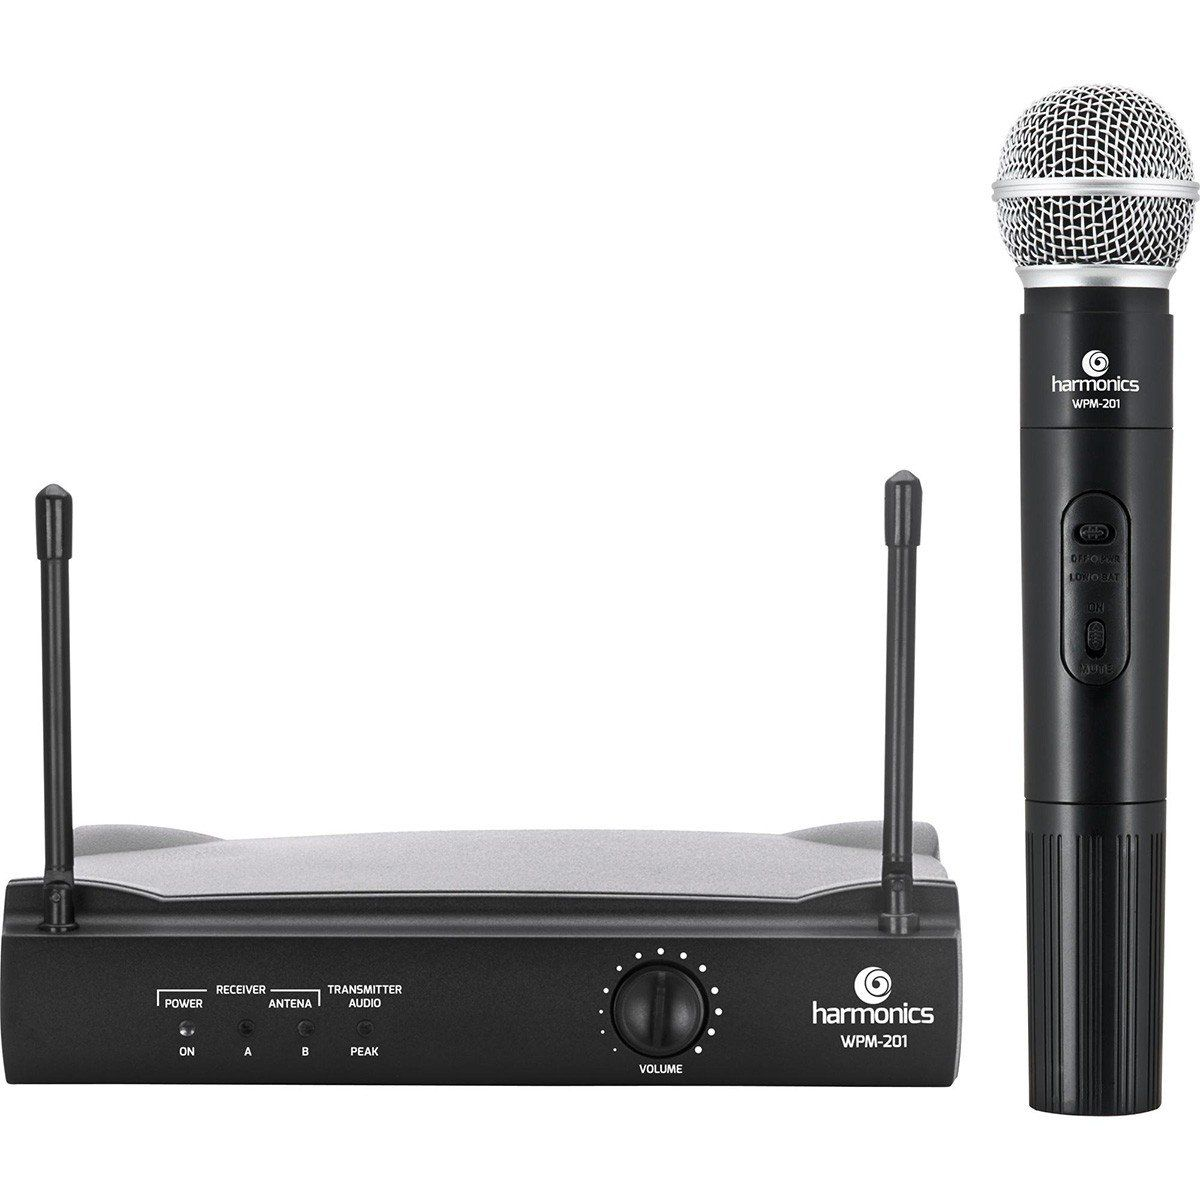 Harmonics WPM 201 Microfone Cardioide Harmonics WPM-201 Sem Fio Profissional